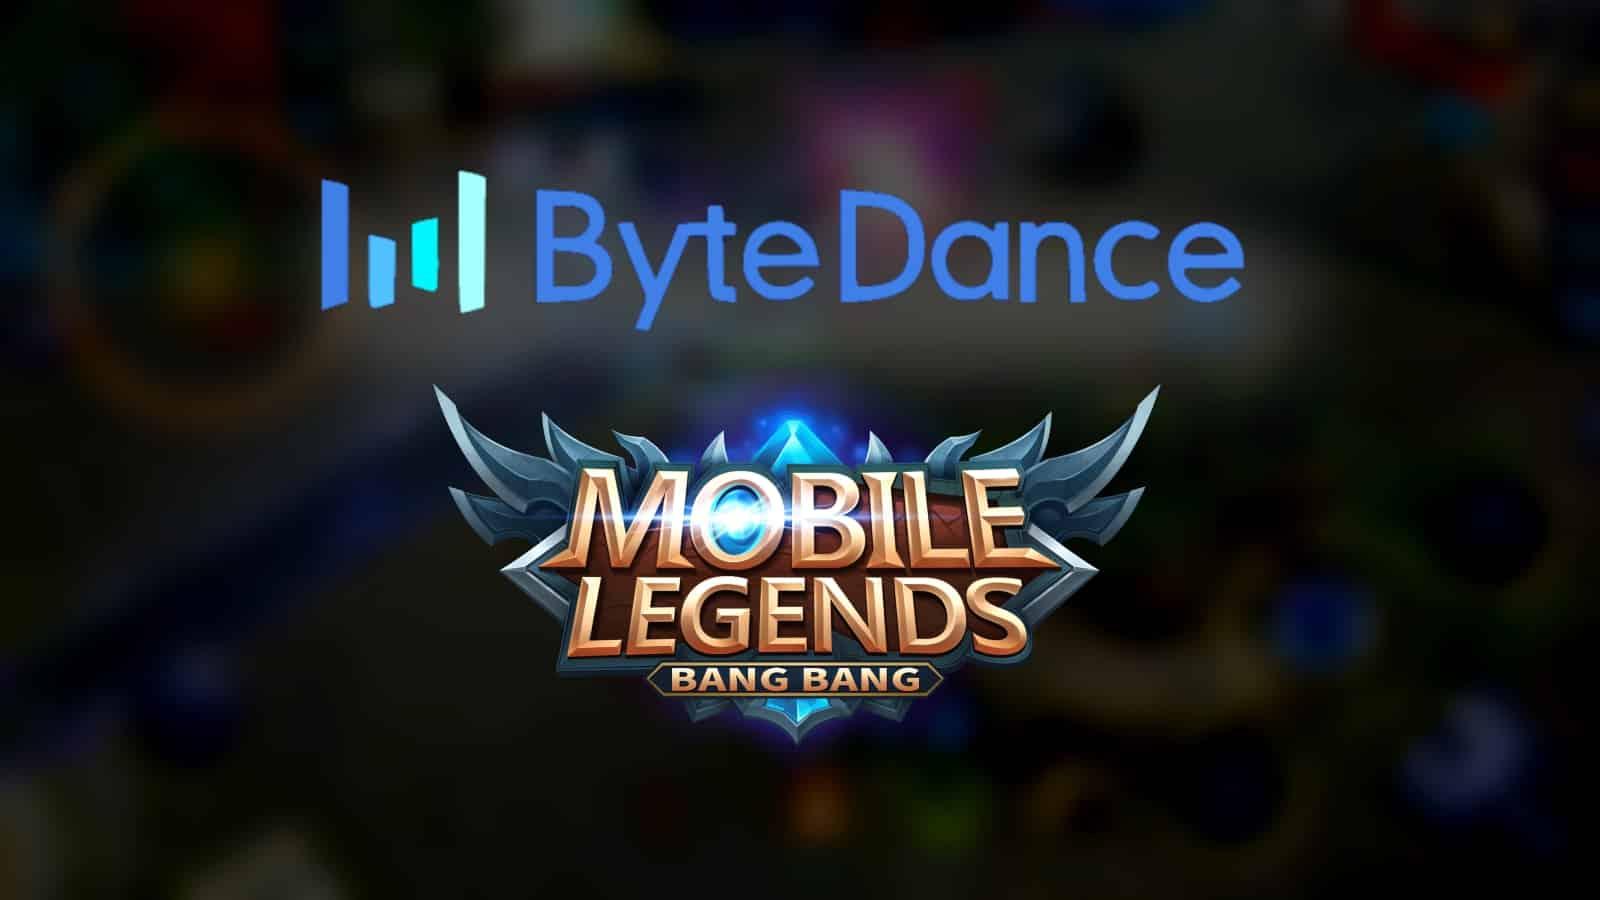 bytedance-acquire-mobile-legends.jpg